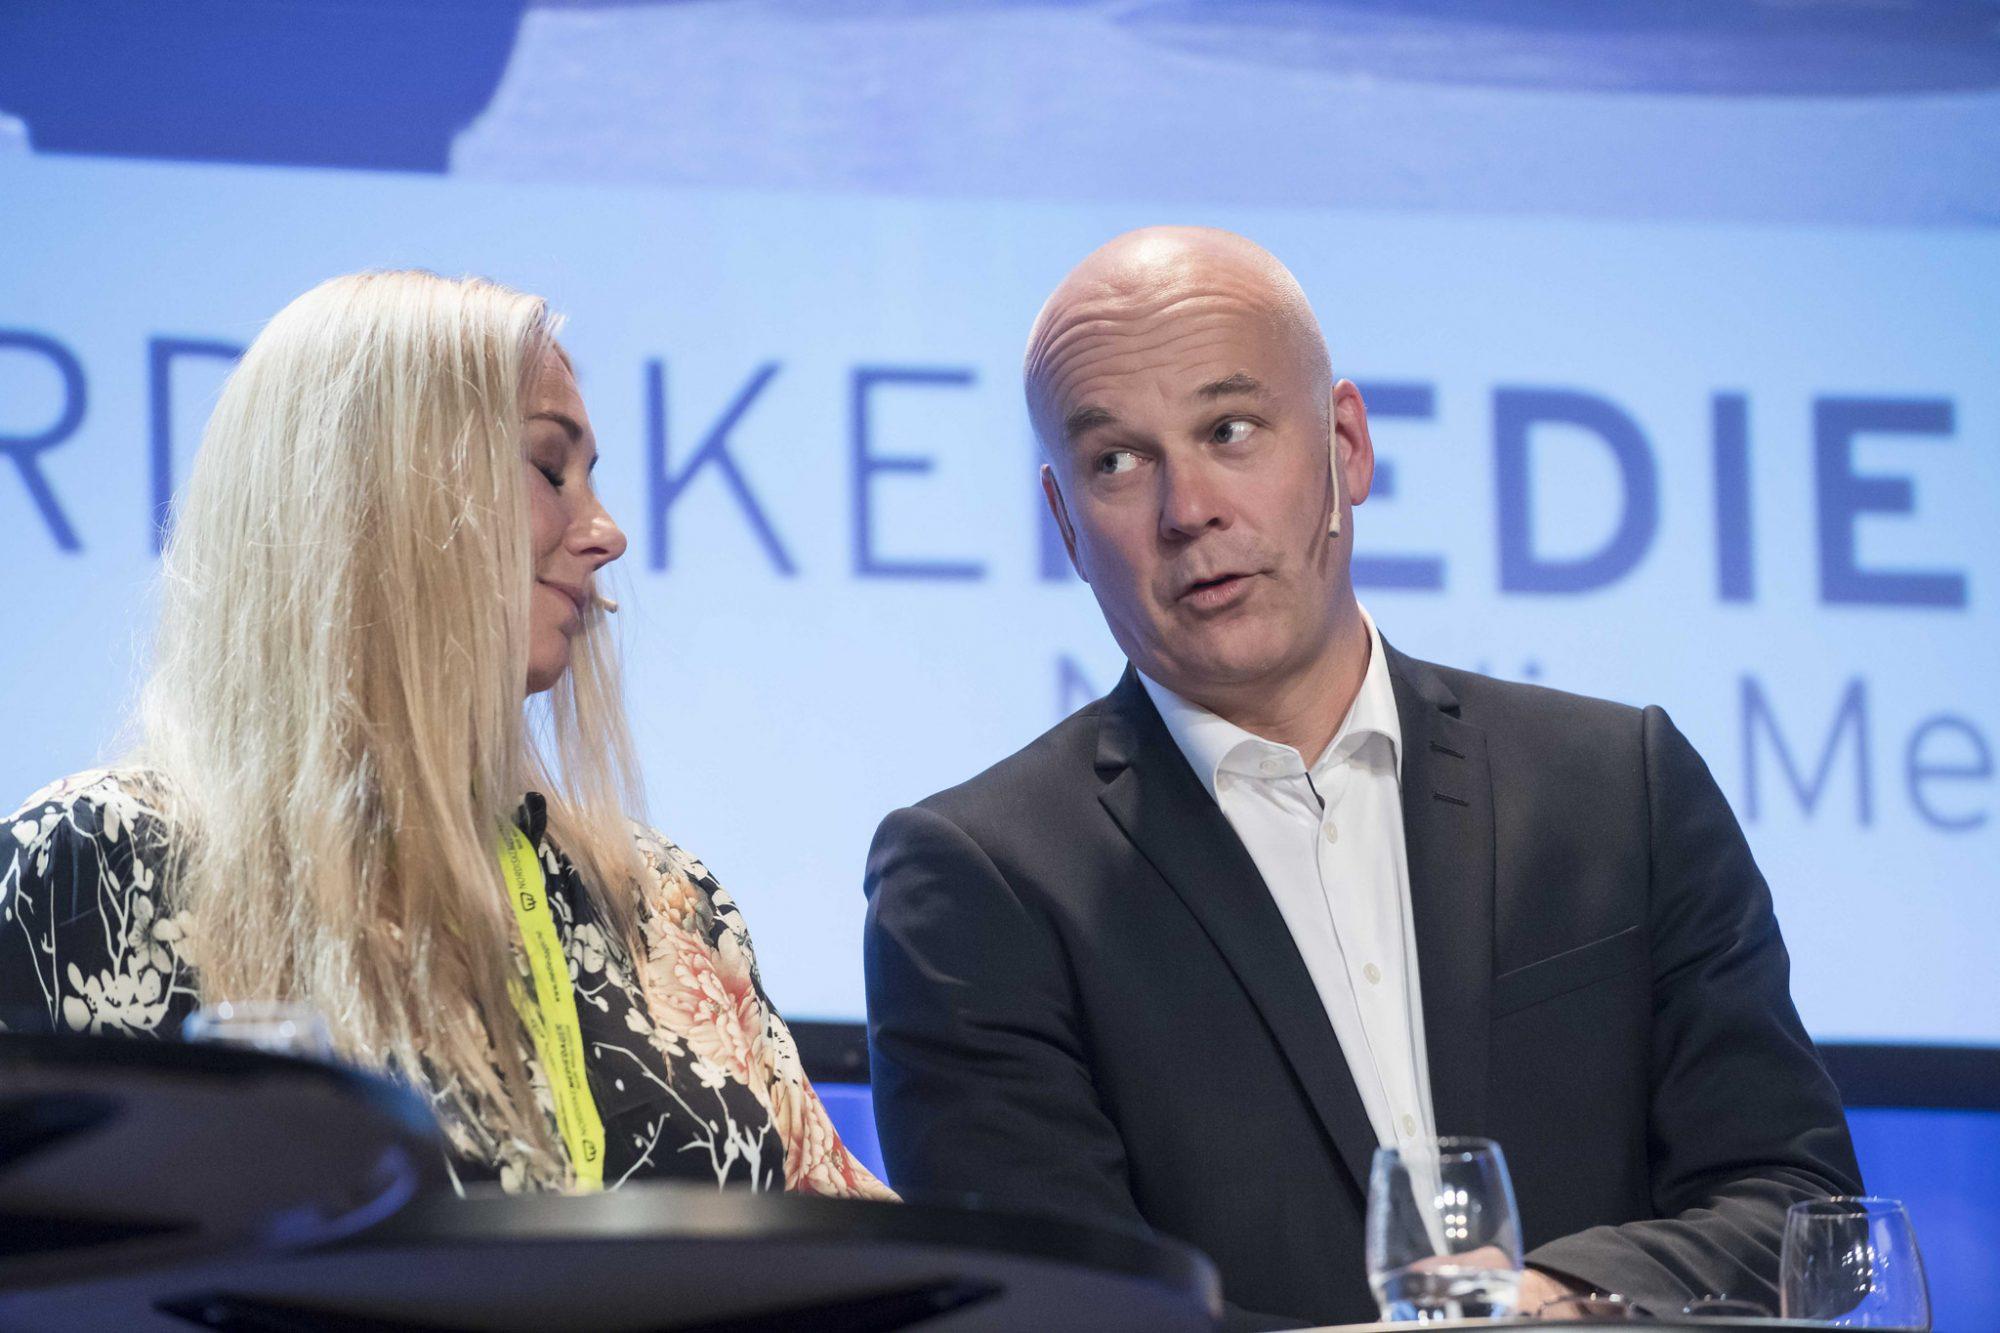 Thor Gjermund Eriksen lovar å fylle nynorskkvota i statskanalen i 2019. Foto: Nordiske Mediedager/Flickr/CC BY-SA 2.0